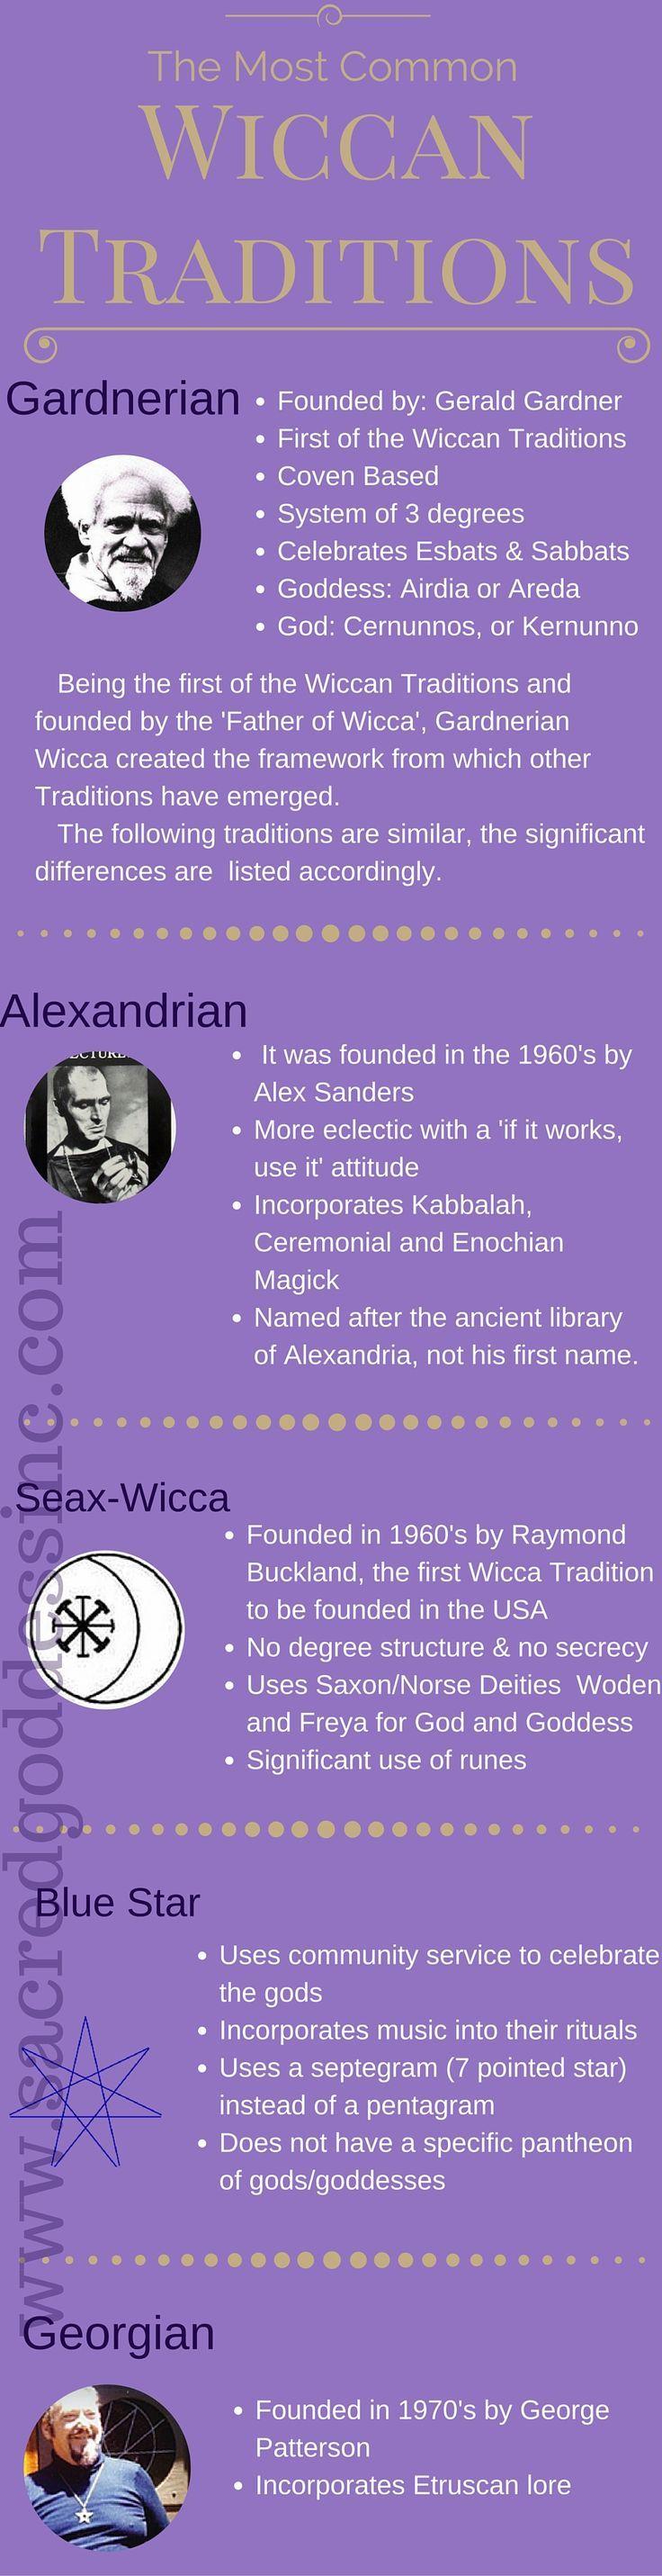 Beginner Wicca - Wiccan Traditions descendant of Gardnerian Wicca: Gardnerian, Alexandrian, Seax-Wicca, Blue Star